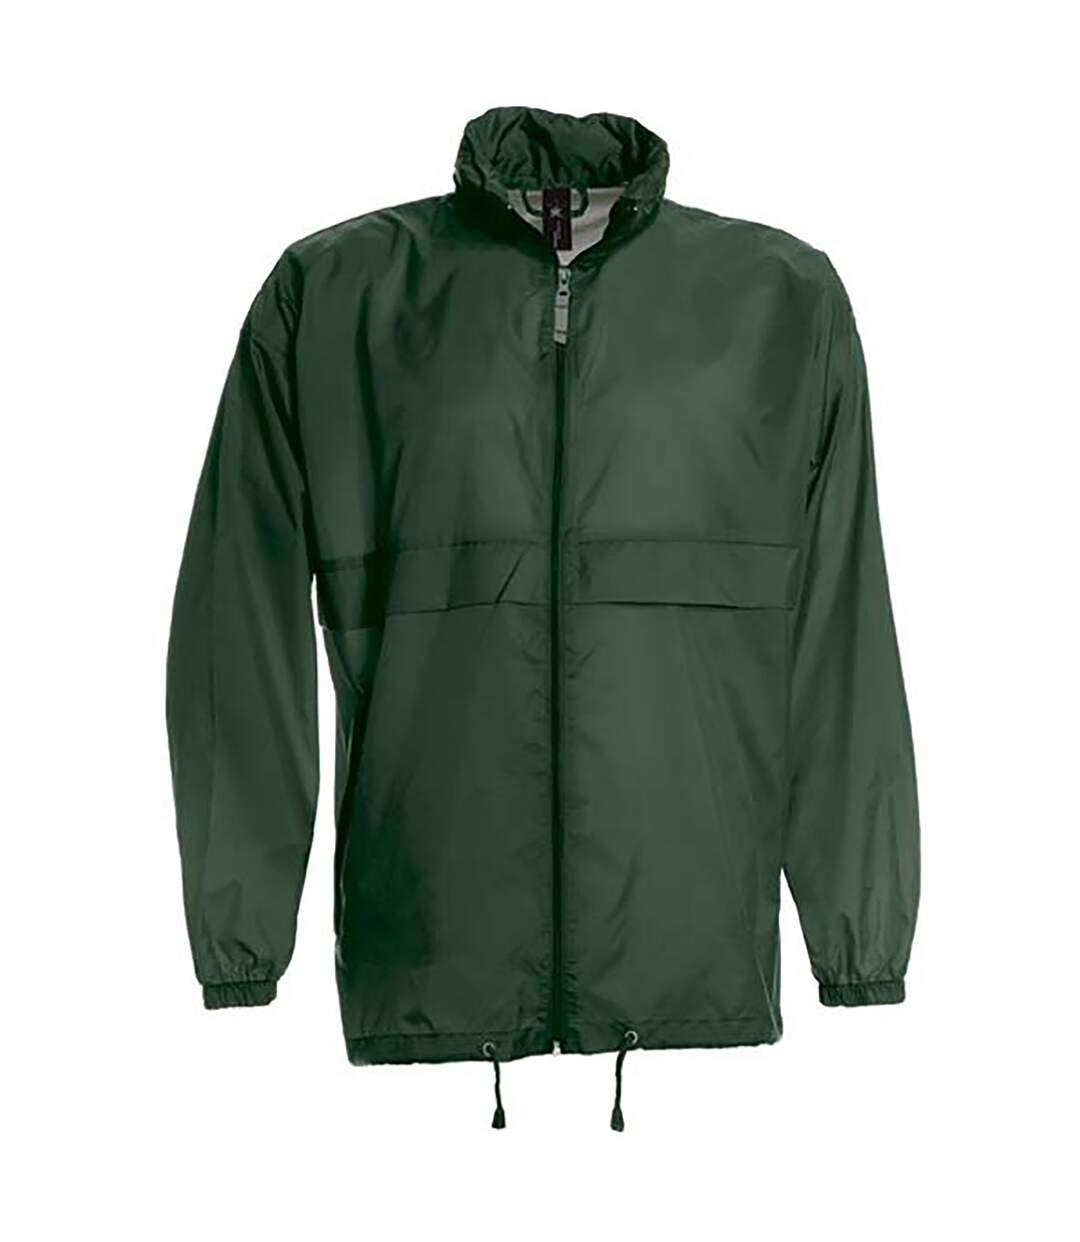 B&C Sirocco Mens Lightweight Jacket / Mens Outer Jackets (Gold) - UTBC102